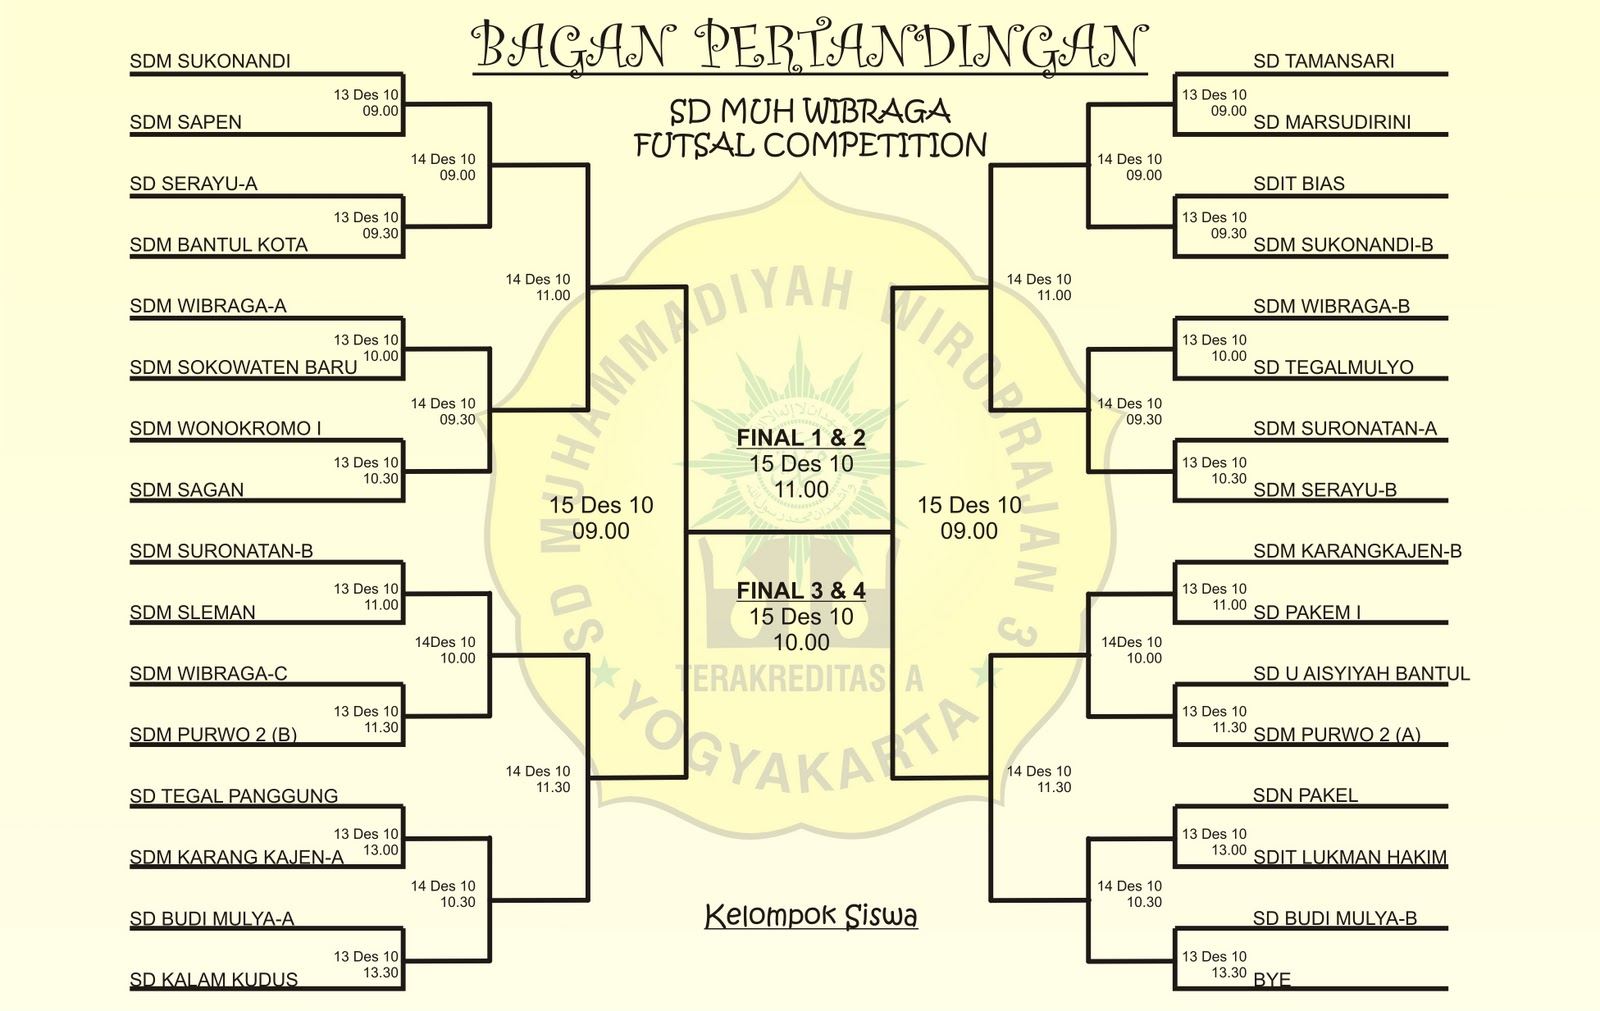 Bagan Pertandingan SD Muh Wibraga Futsal Competition | SD Muhammadiyah ...